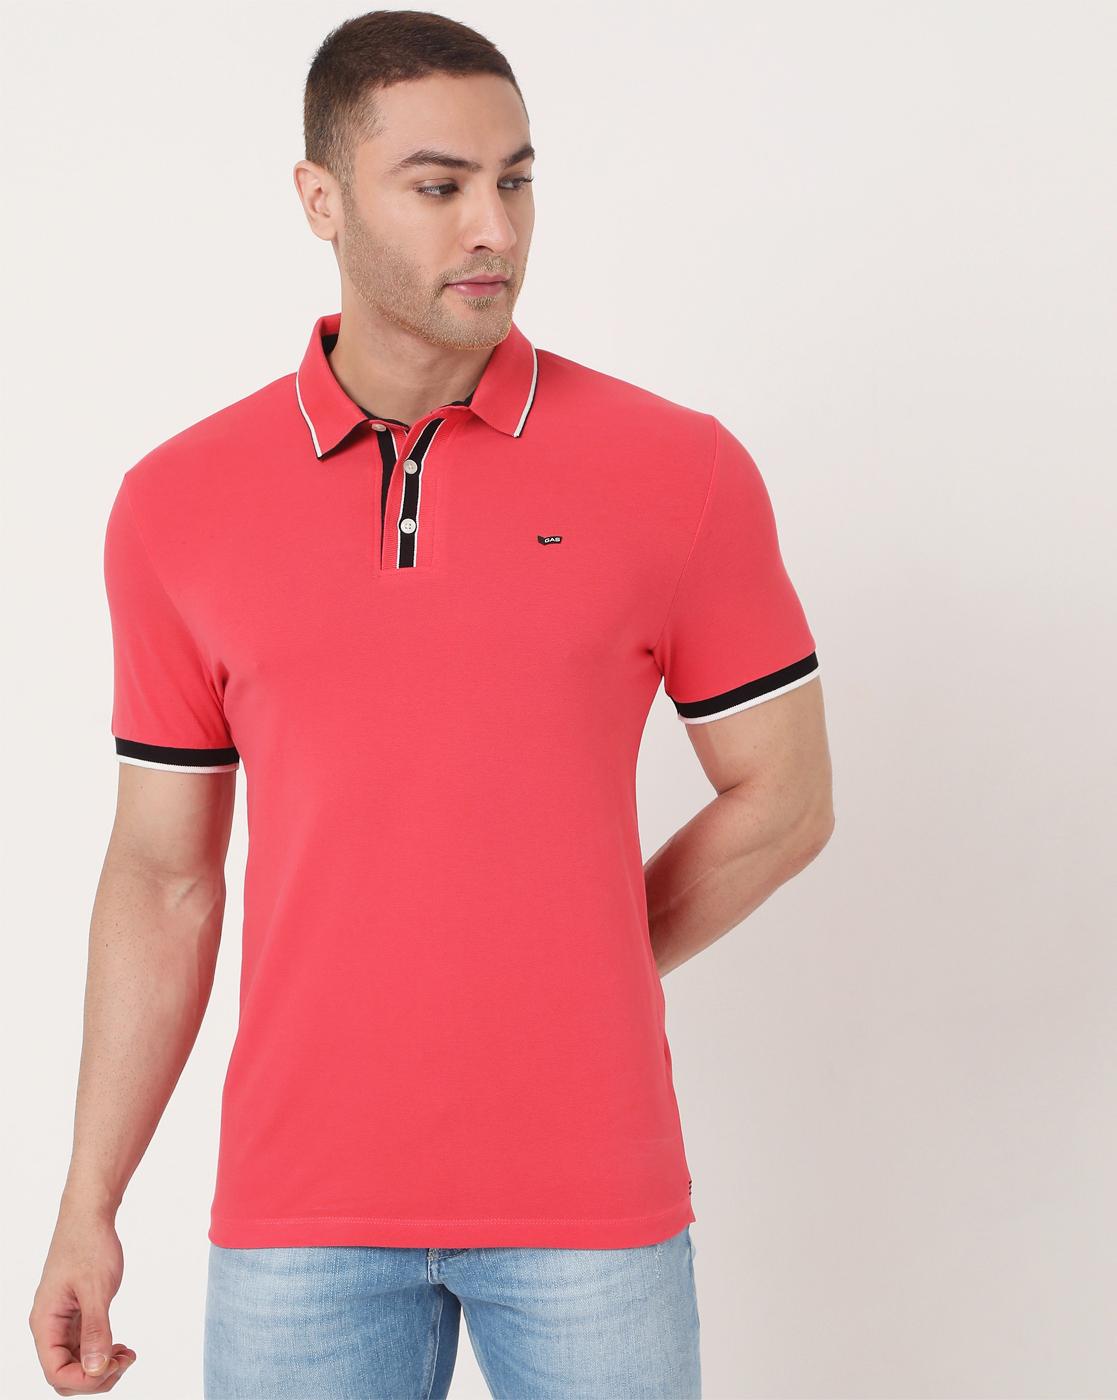 GAS | Men's Agap Ec In Slim Fit Solid Polo